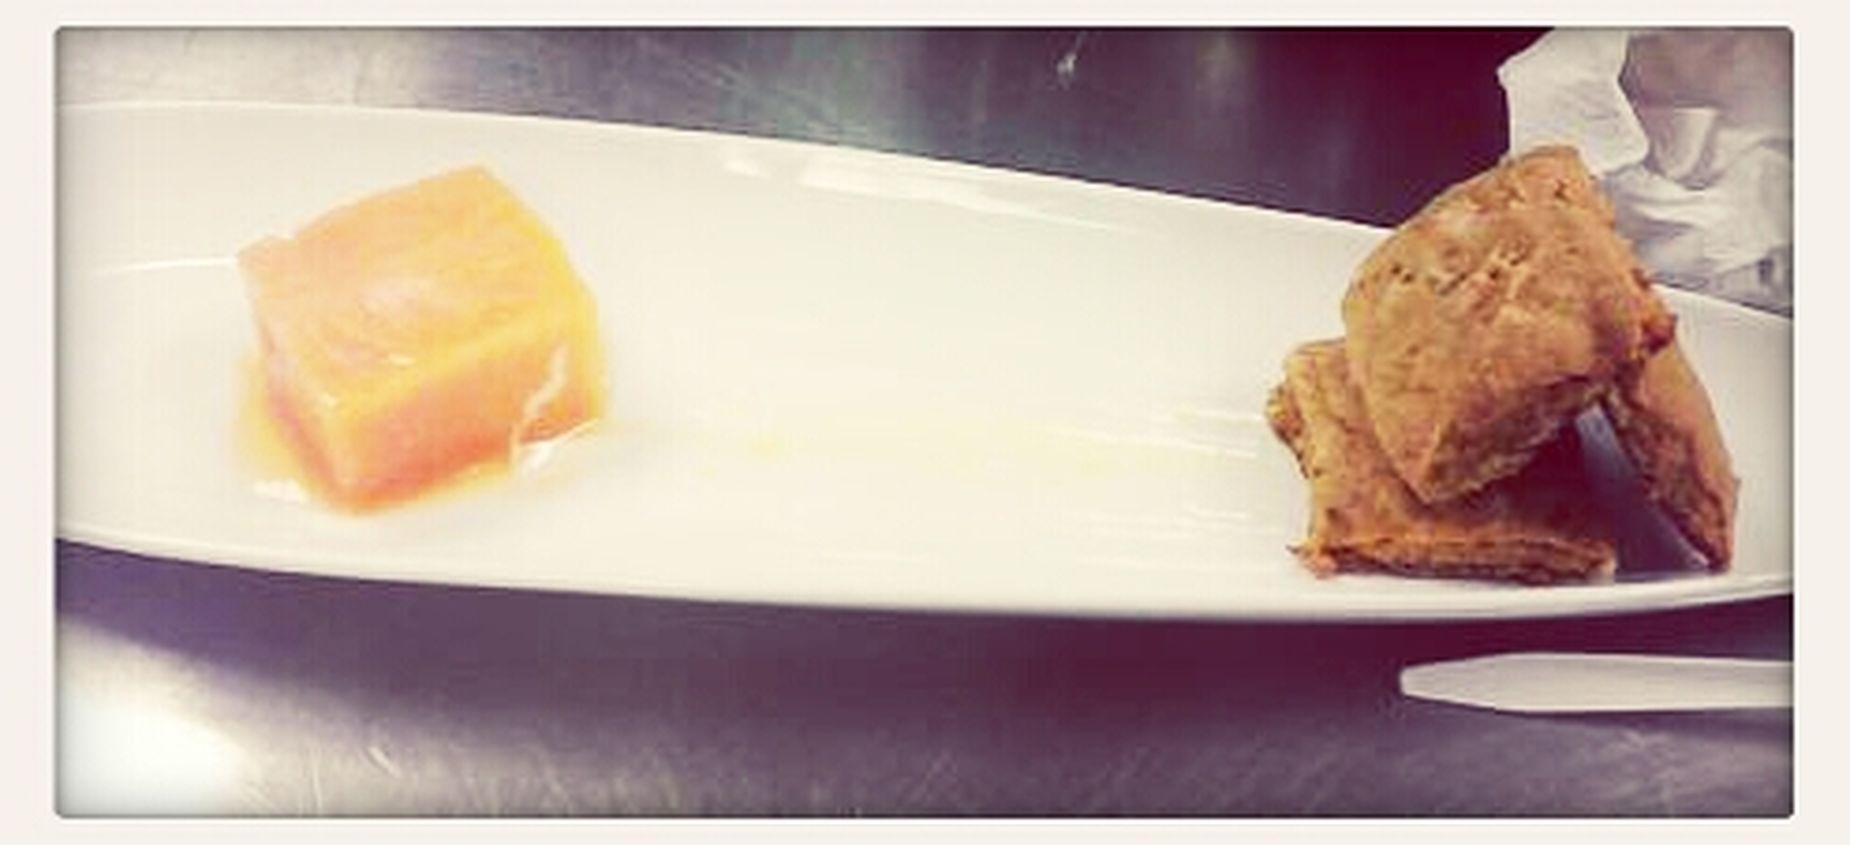 papaya sorbet and papaya cookie with orange zest glace